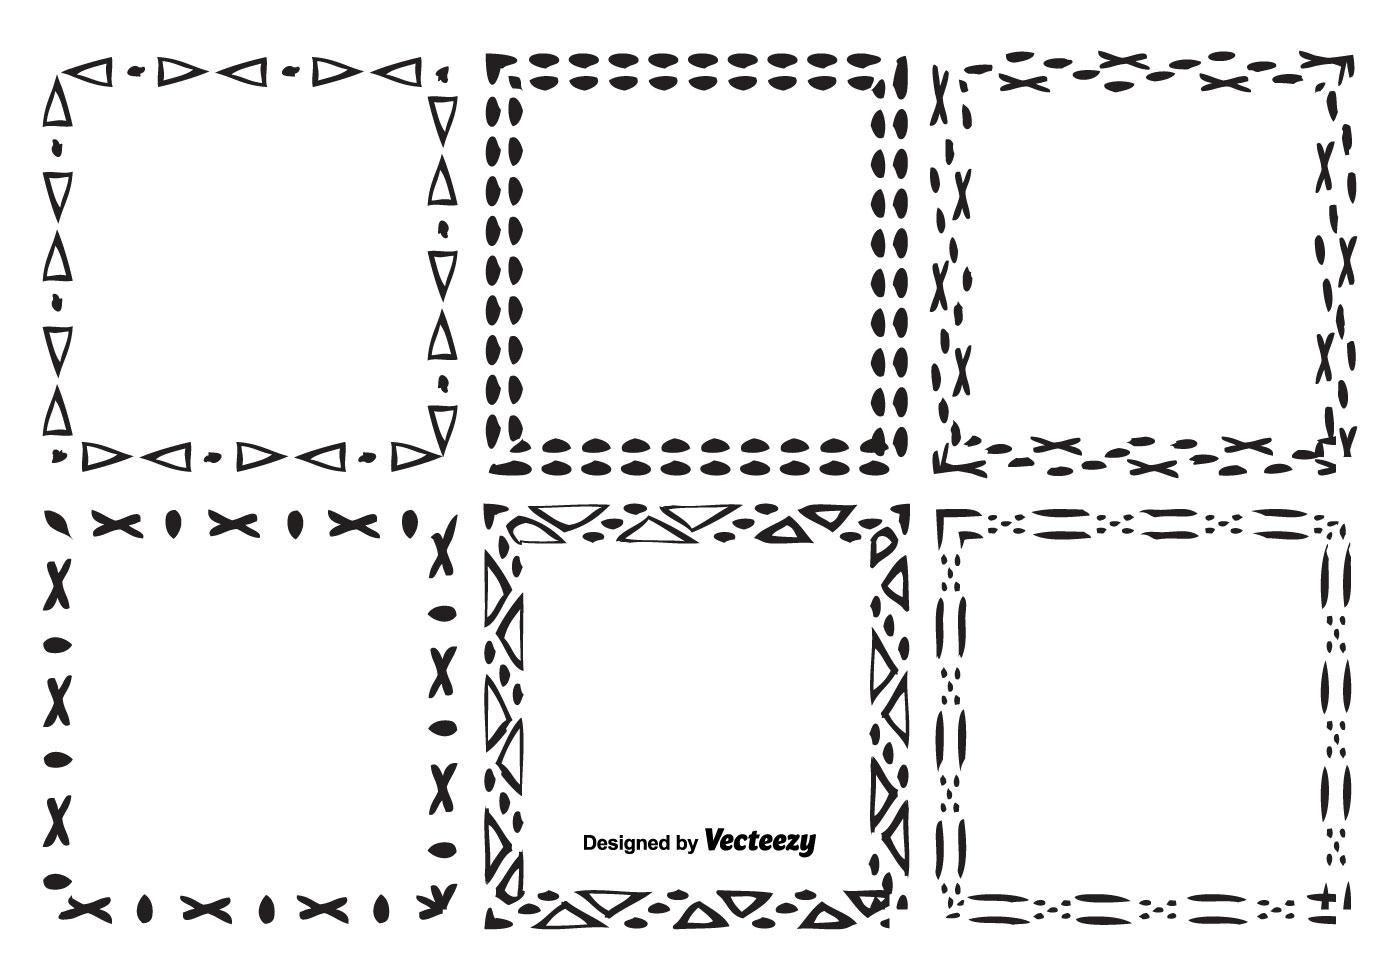 Handgezeichneten Stil Vektor Rahmen Set - Kostenlose Vektor-Kunst ...